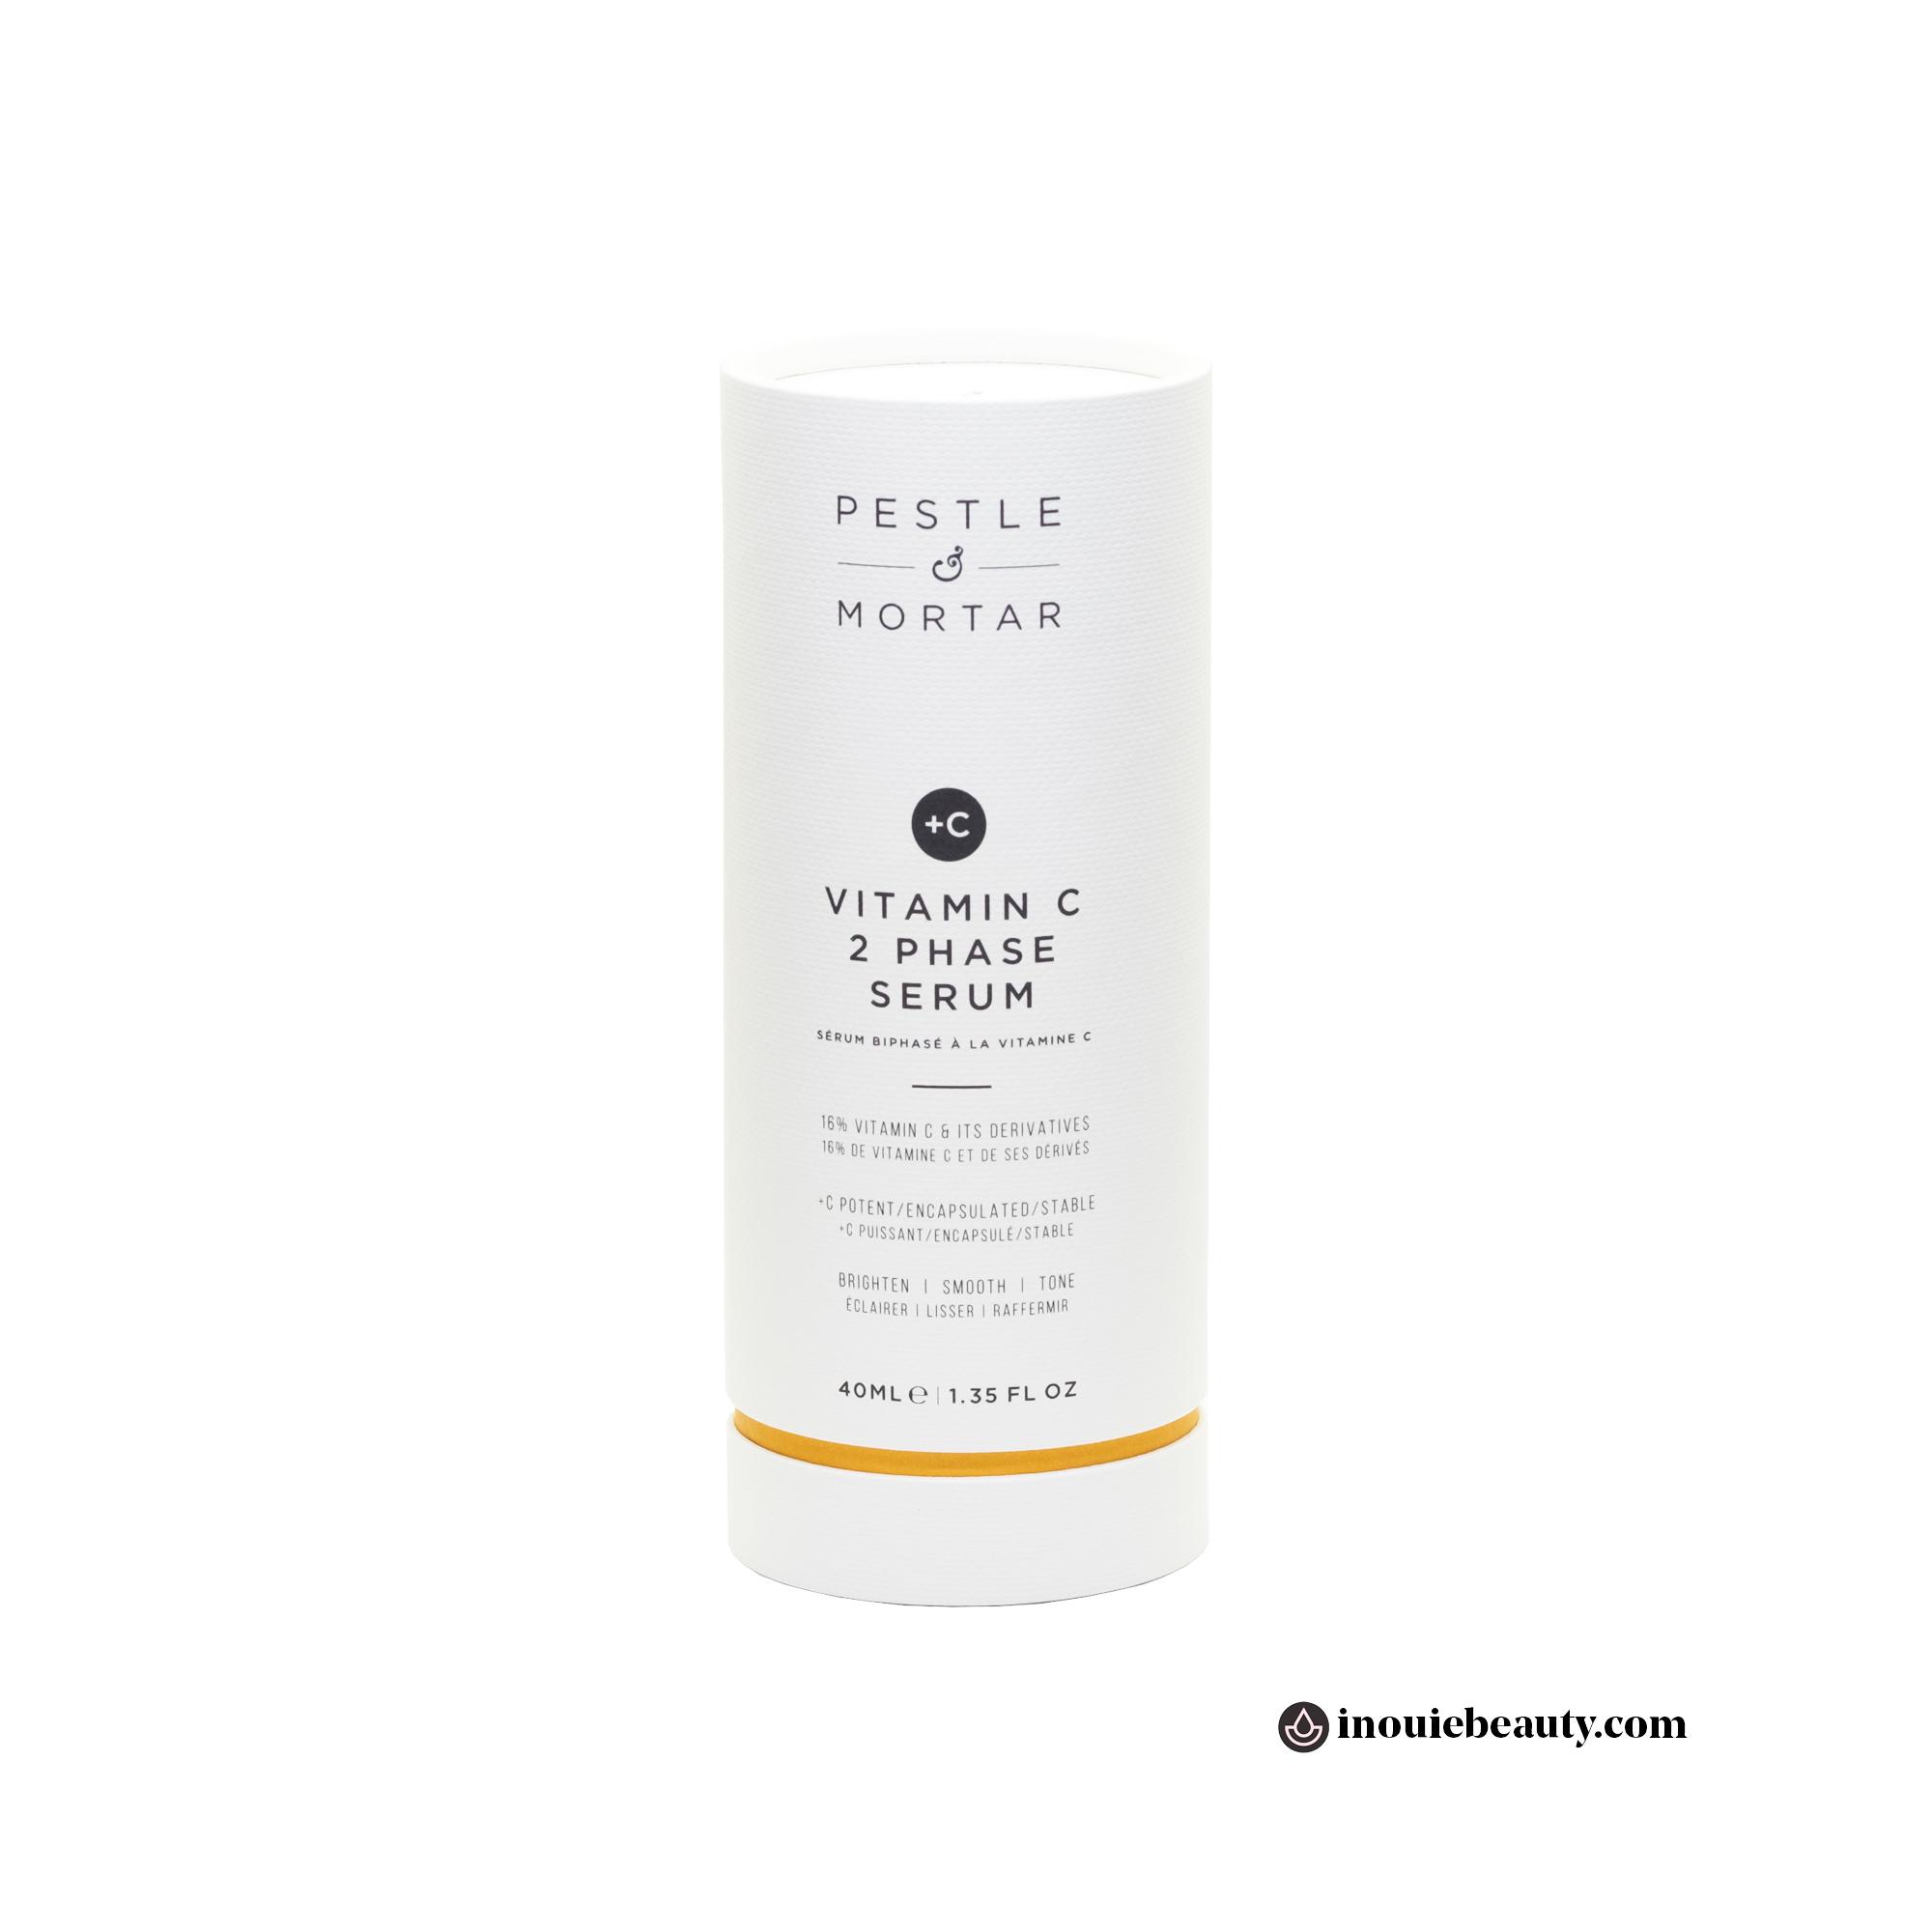 Pestle & Mortar Vitamin C 2 Phase Serum